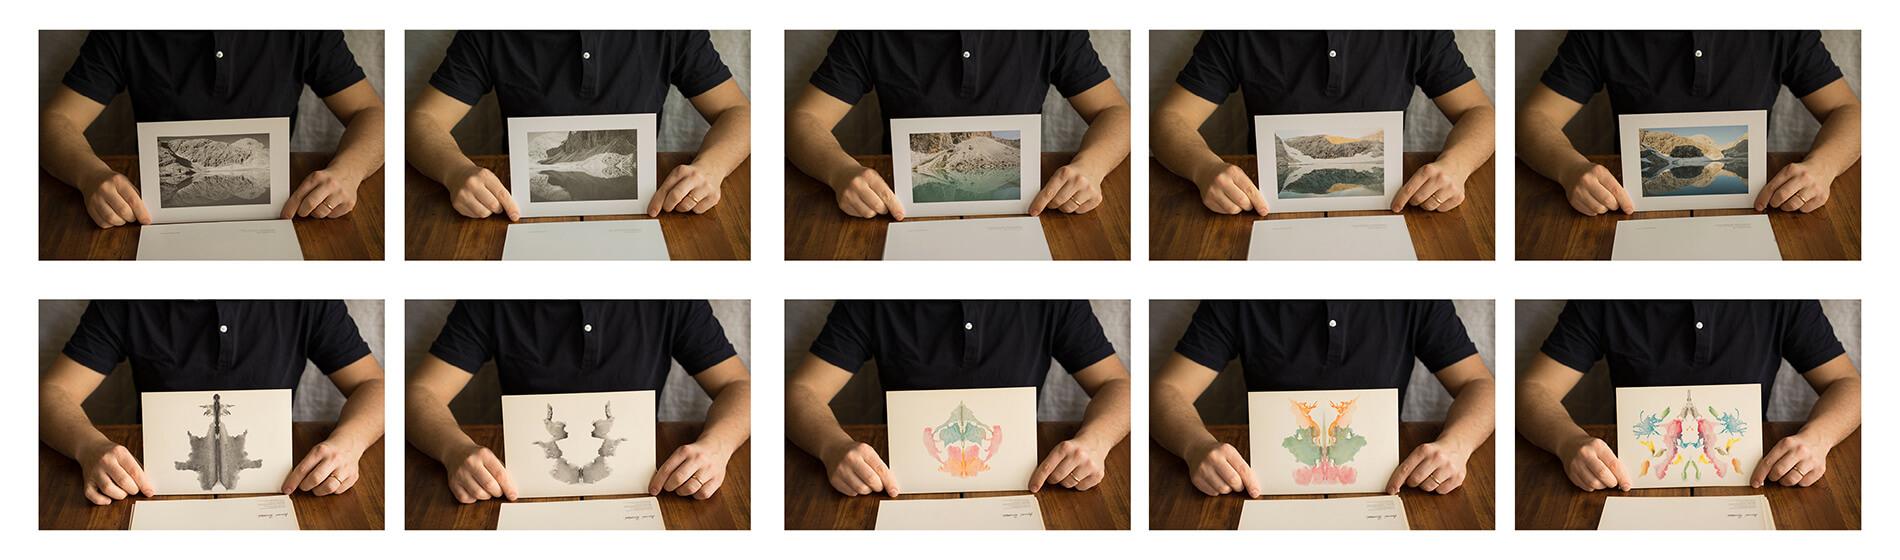 12 Fotodiagnostik Concept Davide Baldrati